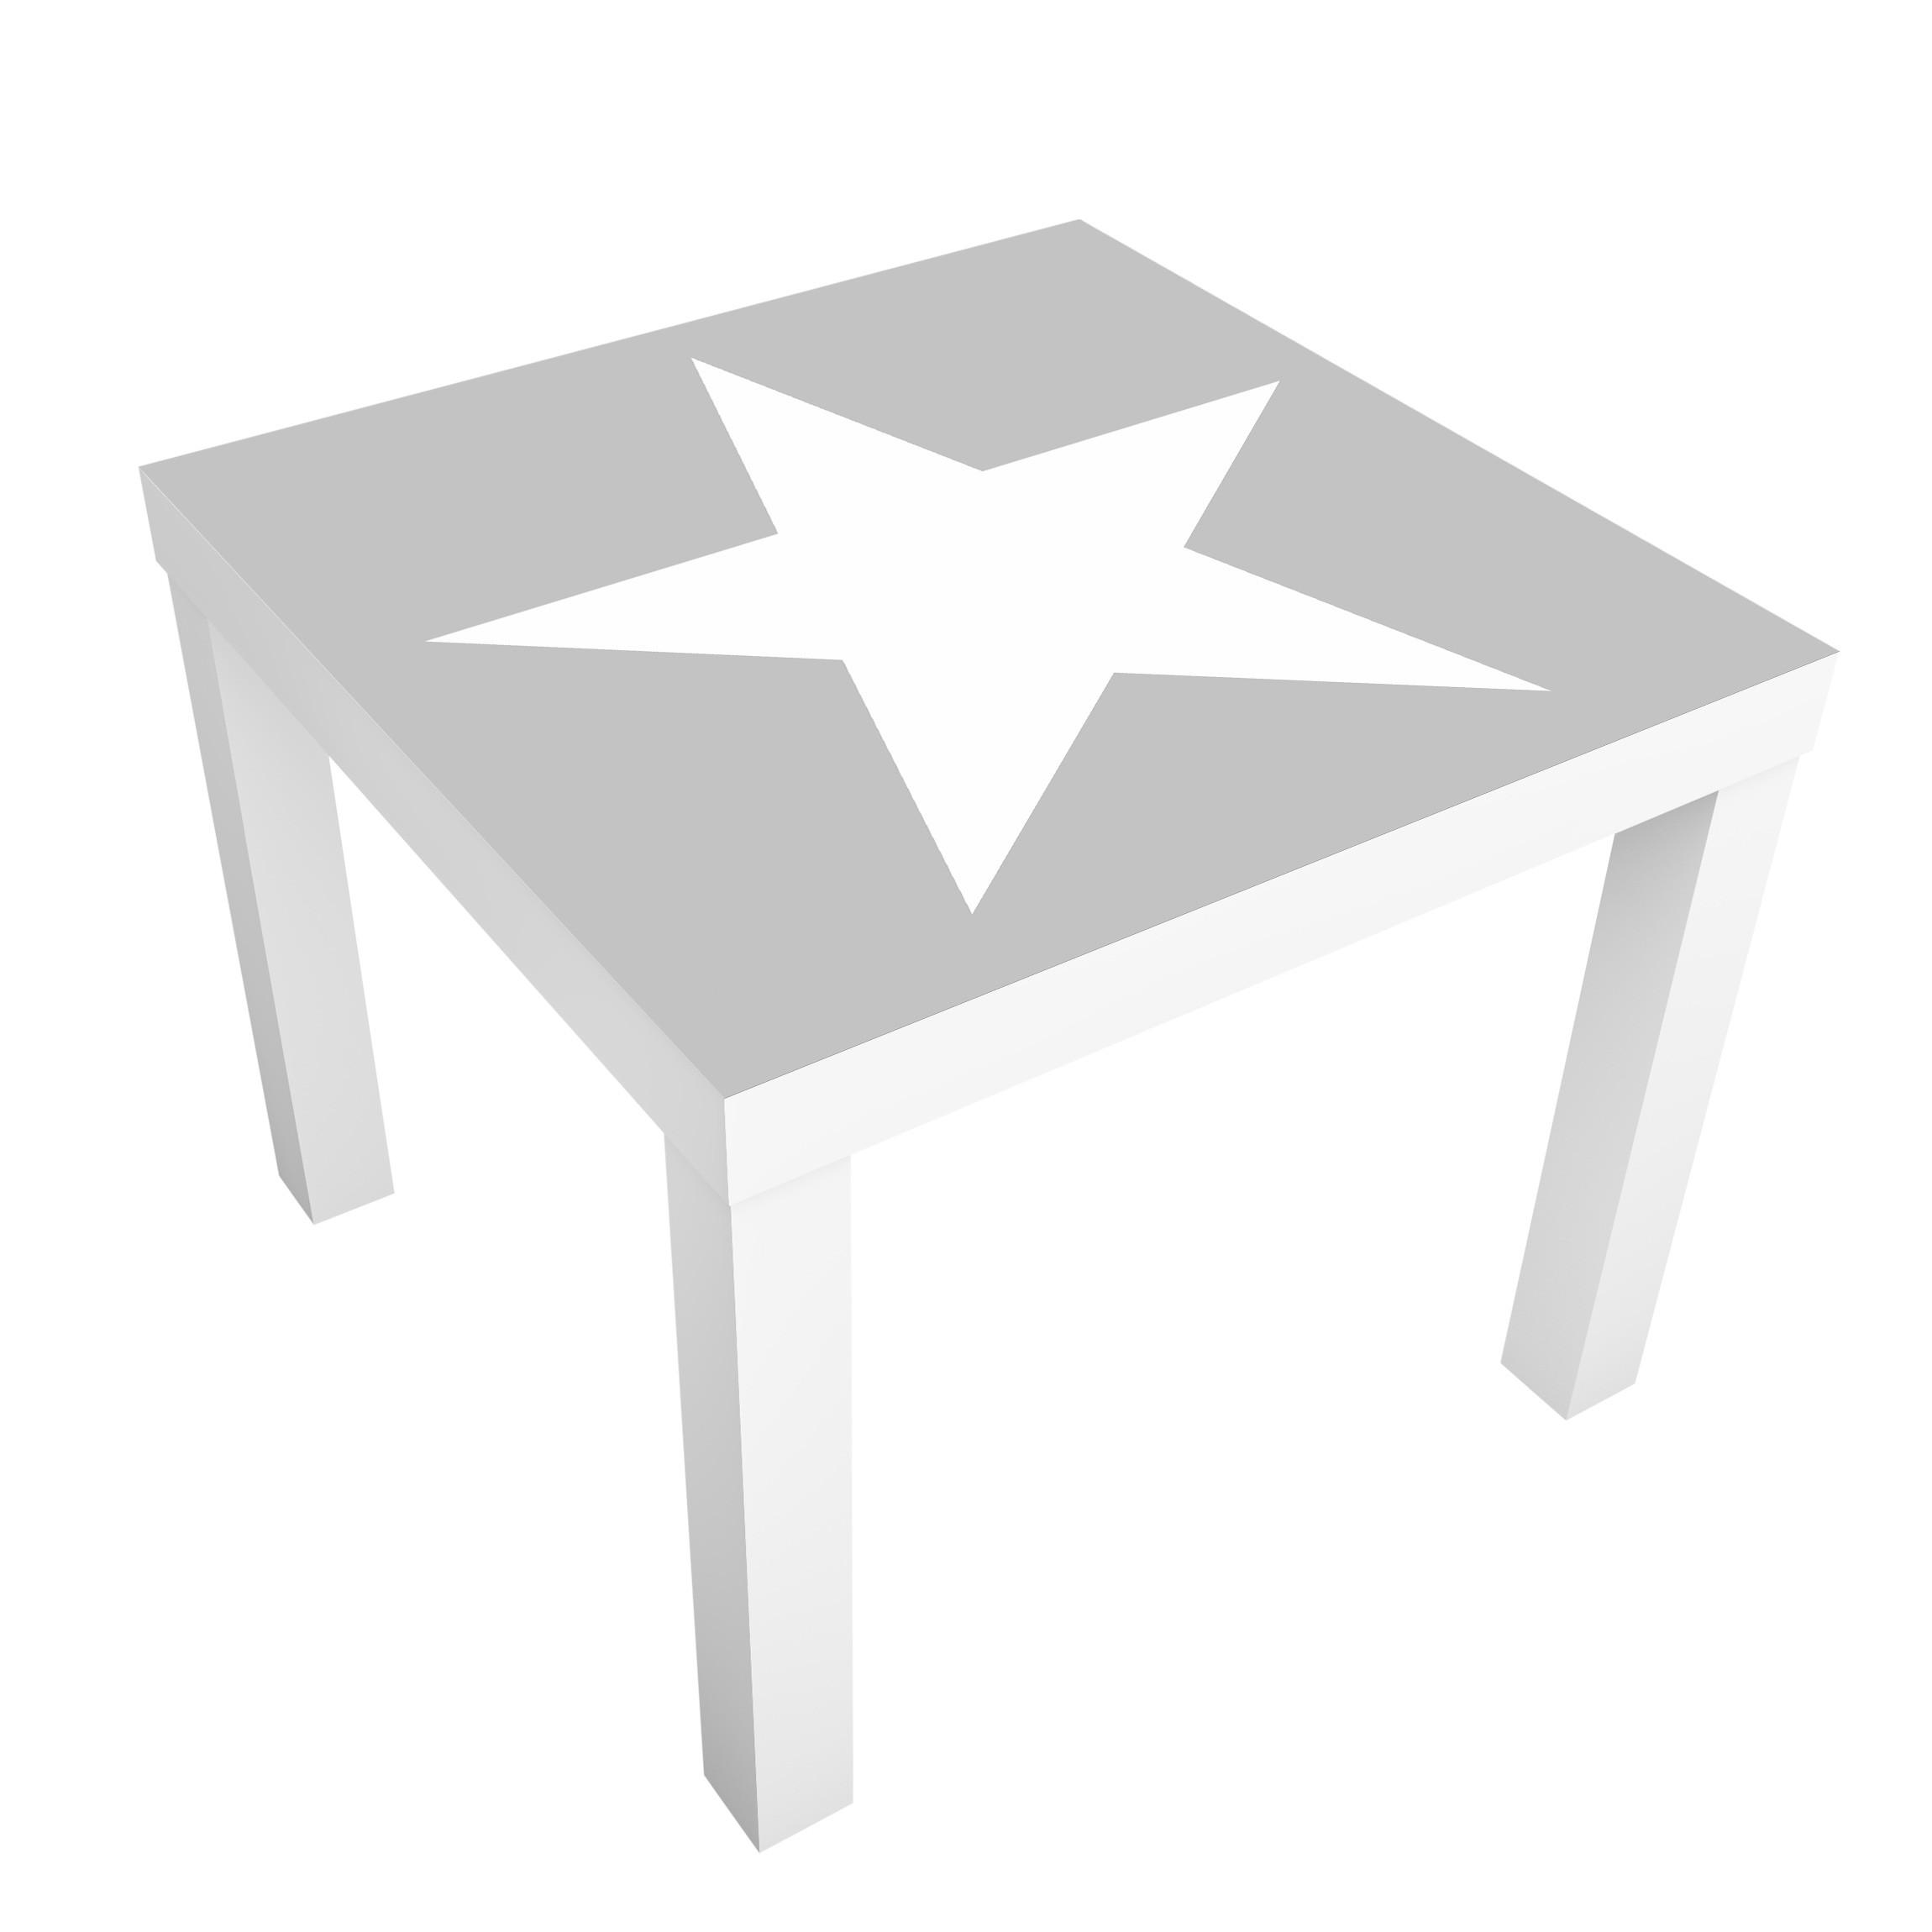 Carta adesiva per mobili ikea lack tavolino large white stars on grey - Ikea lack tavolino ...